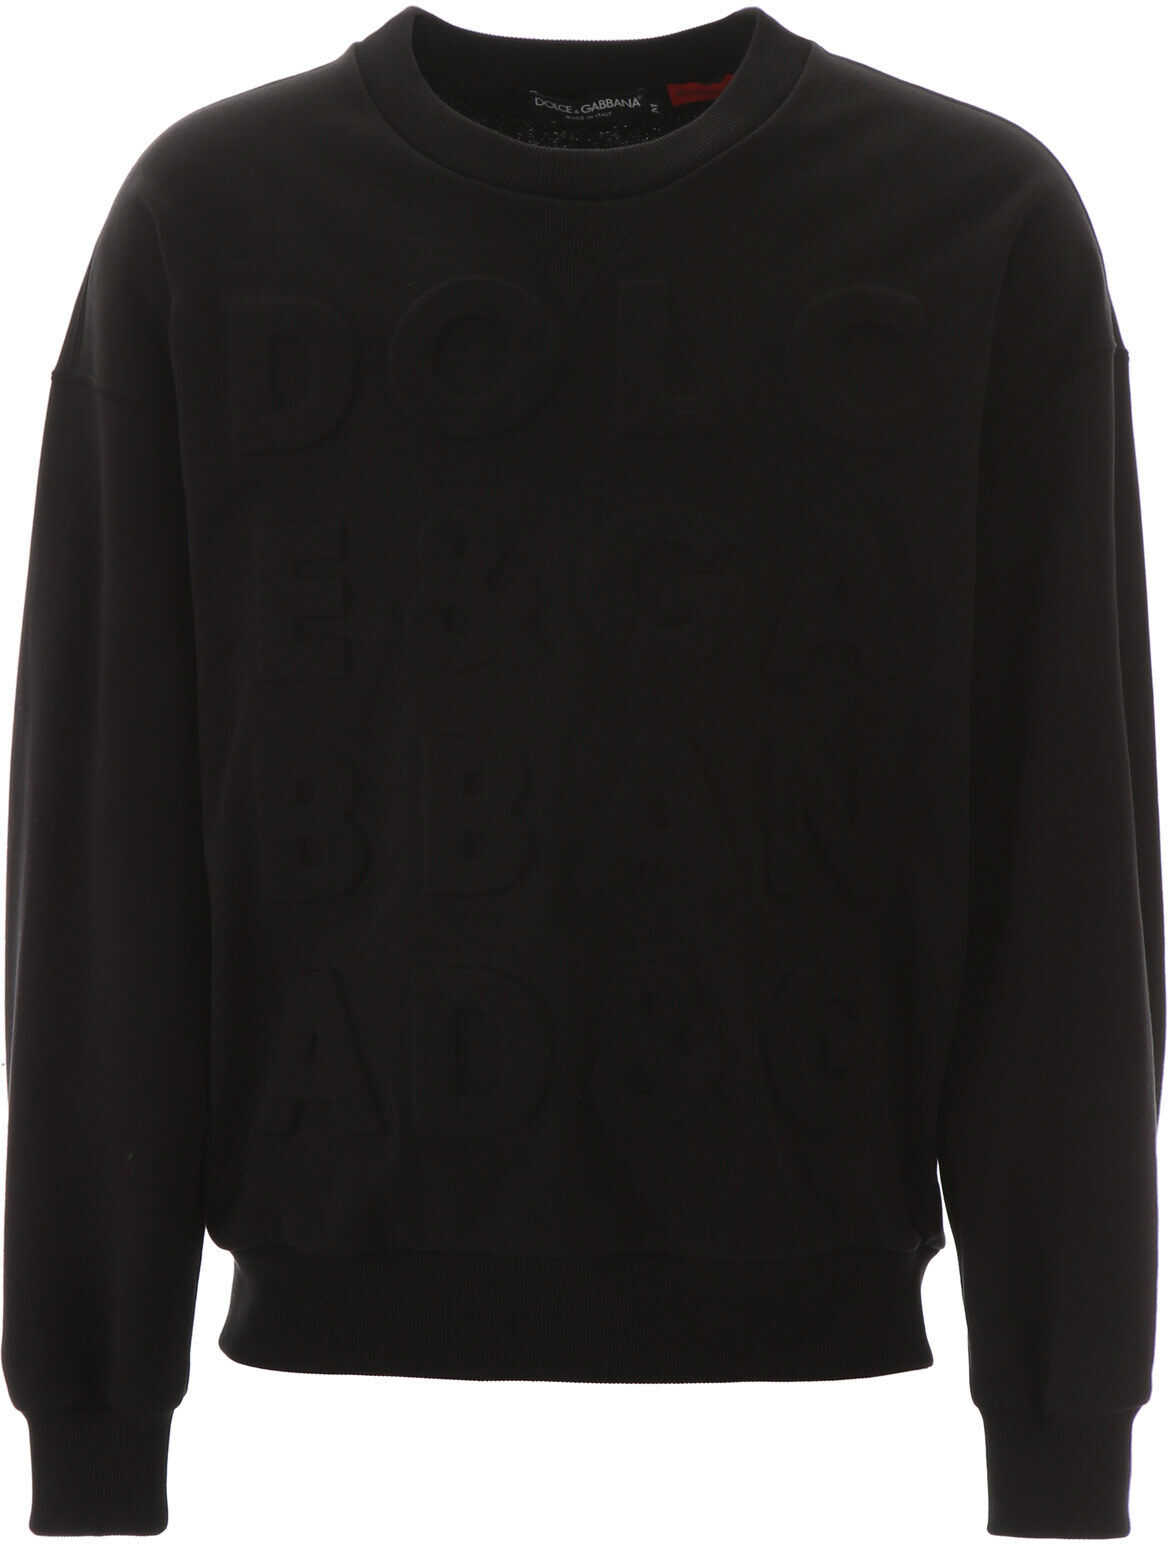 Dolce & Gabbana Logo Sweatshirt NERO